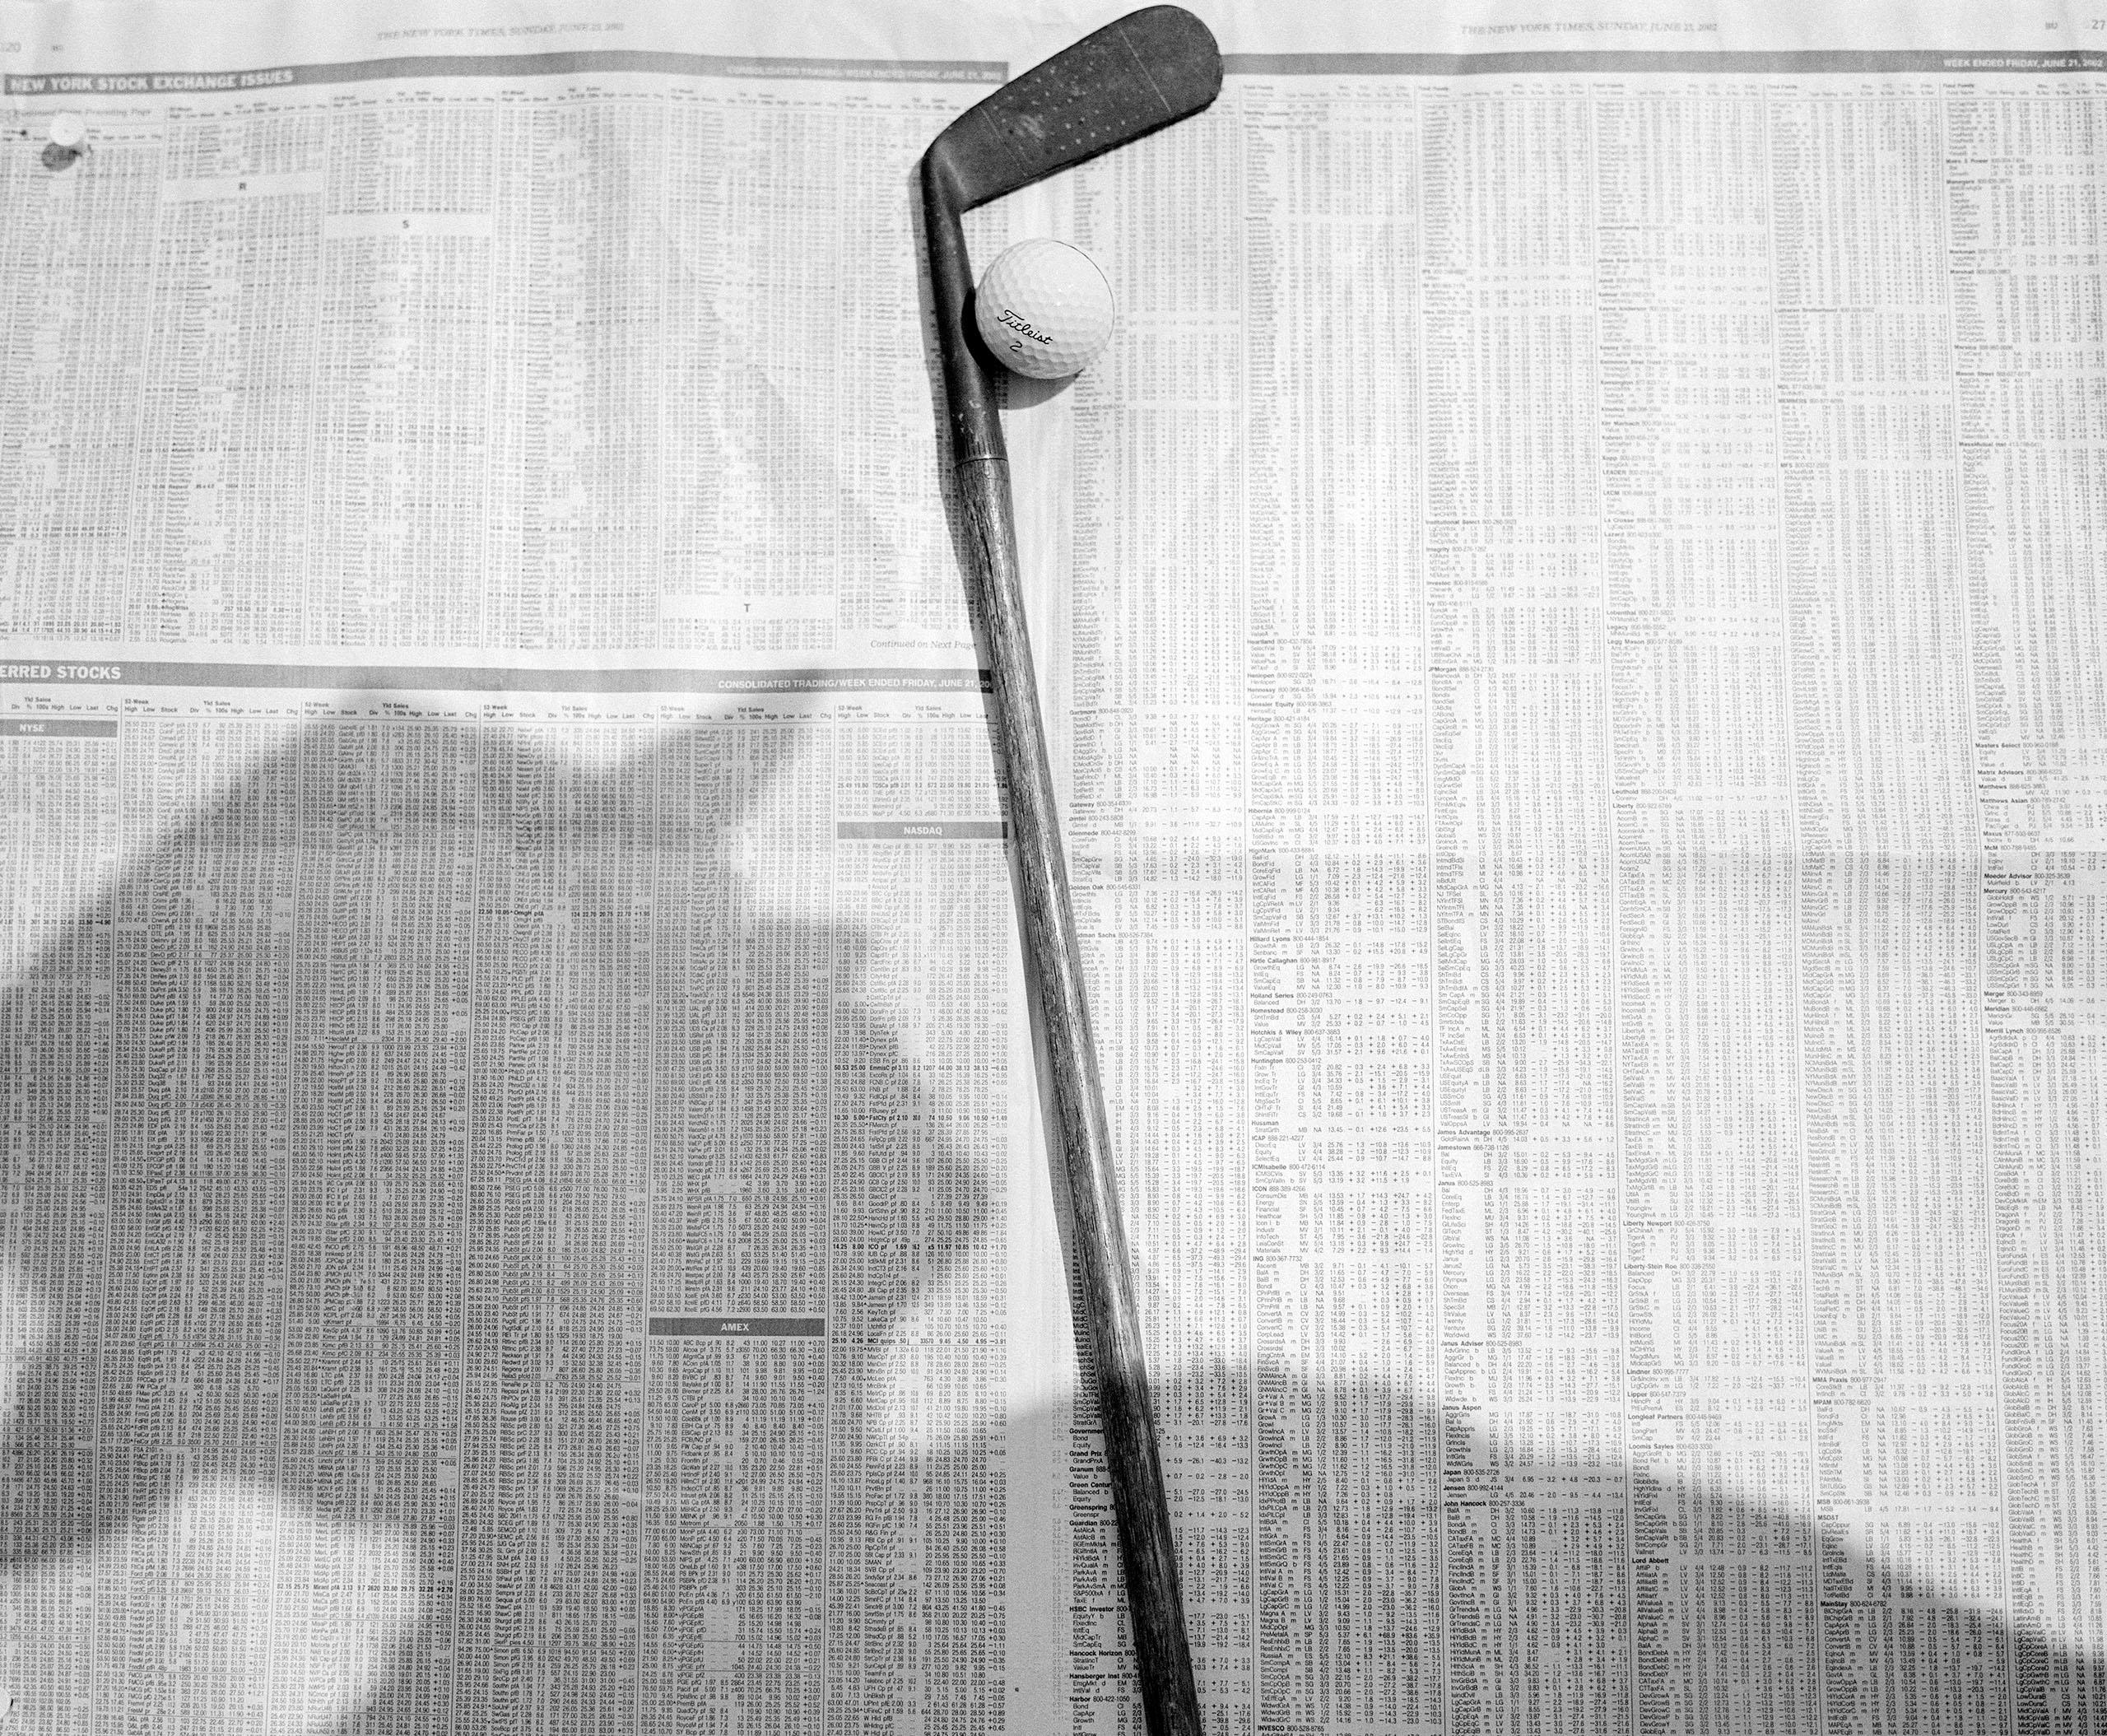 Golf club and shadow, Manhattan Woods, Nyack, New York, 2002